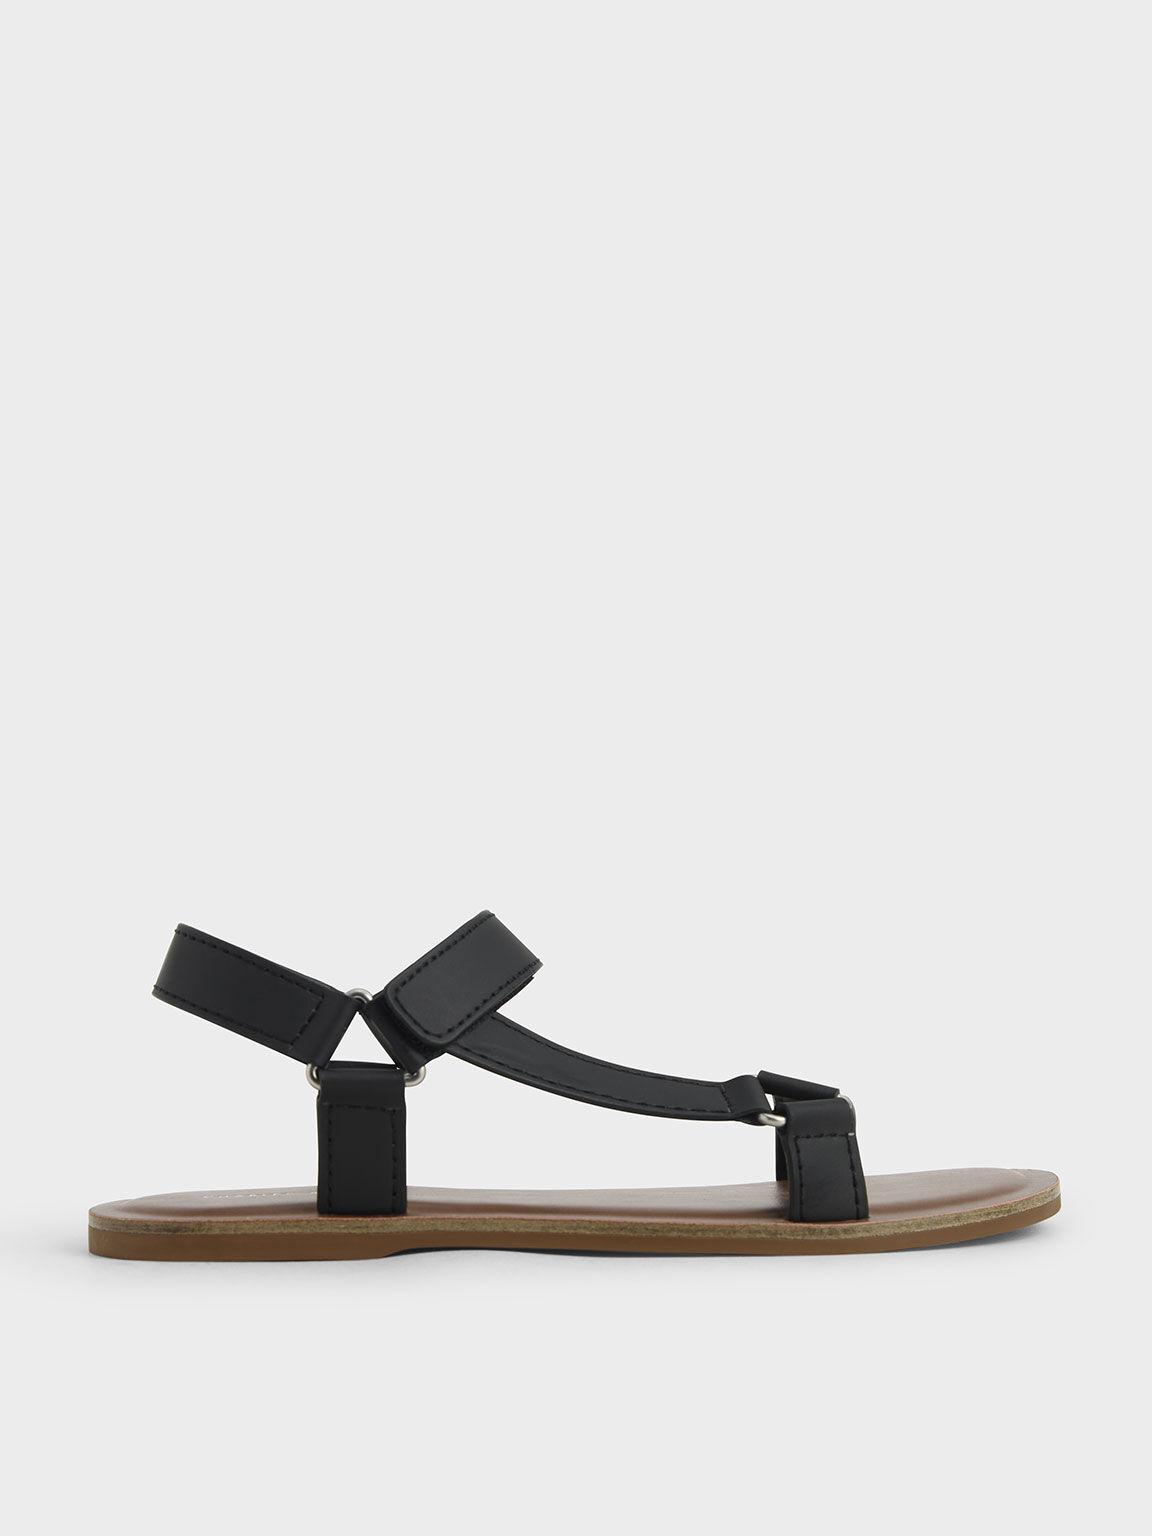 Asymmetric Strap Sandals, Black, hi-res